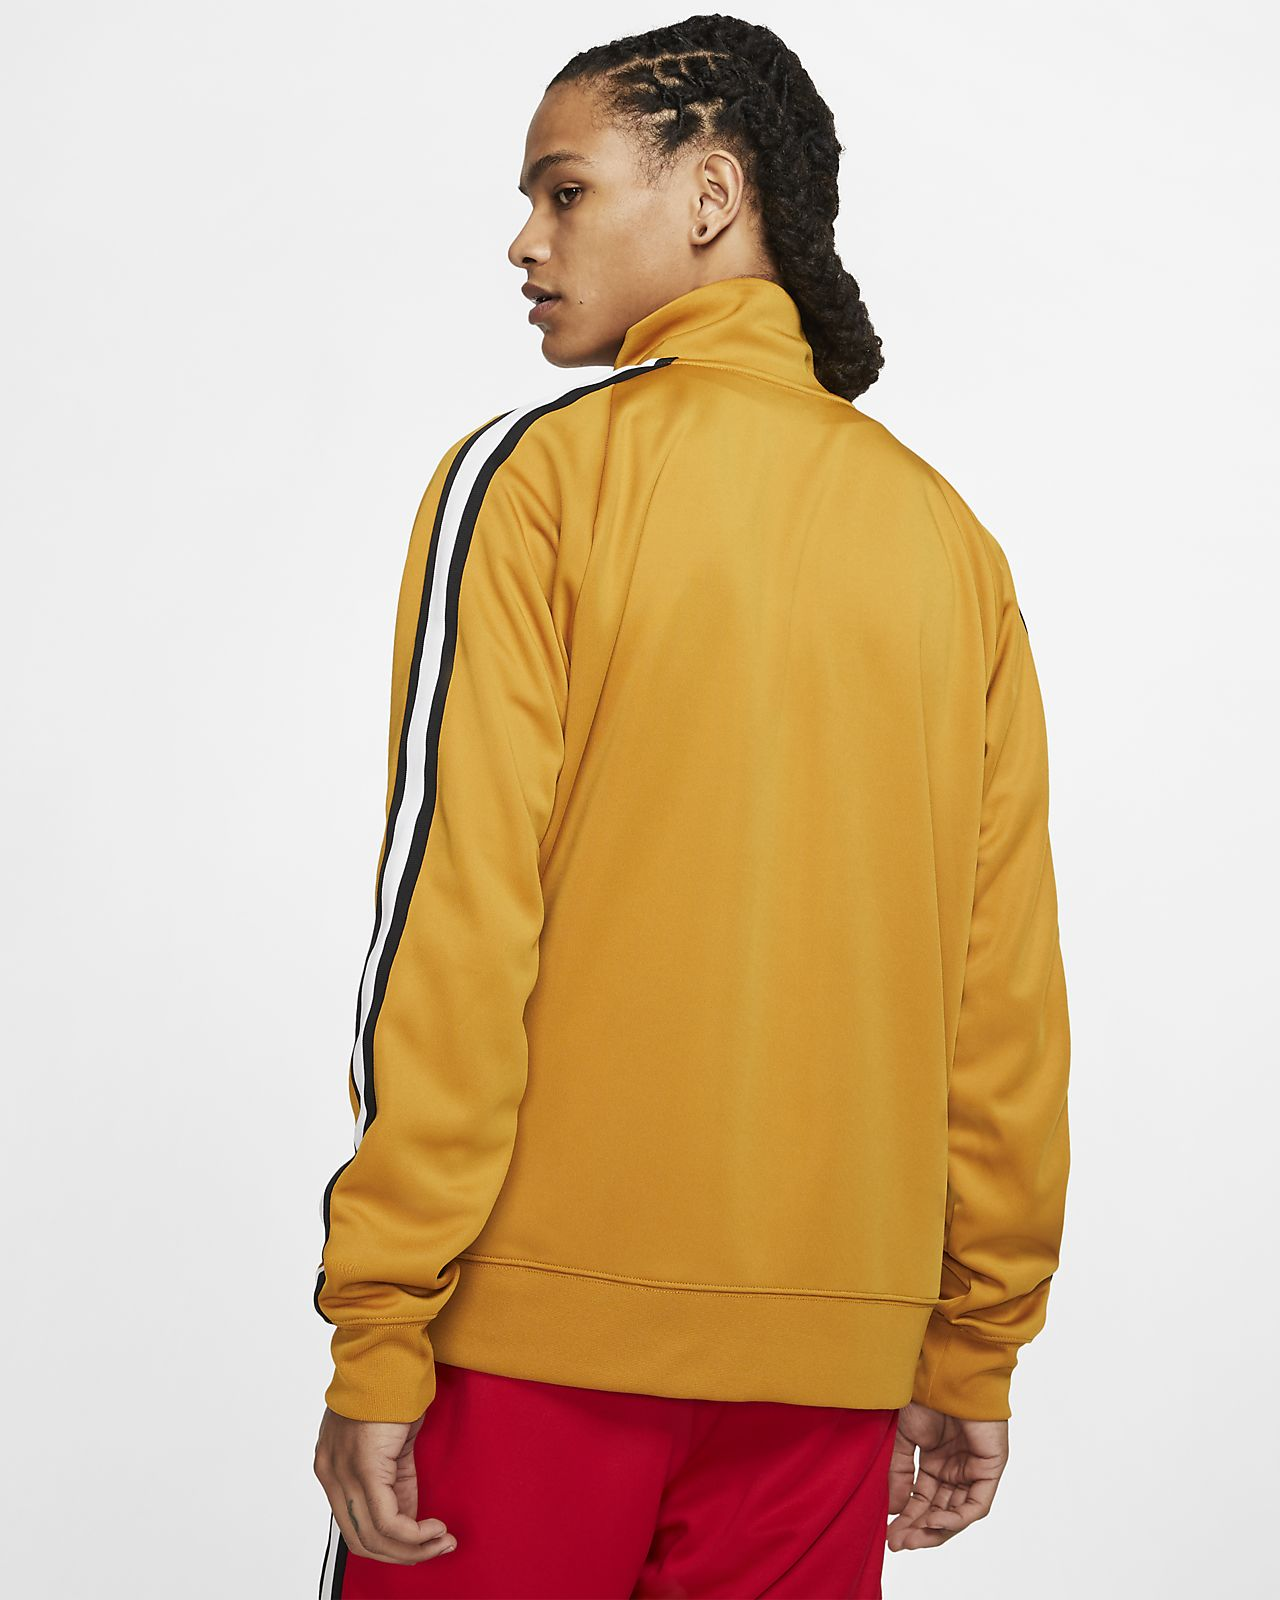 563f77e52 Nike Sportswear N98 Men's Knit Warm-Up Jacket. Nike.com ZA